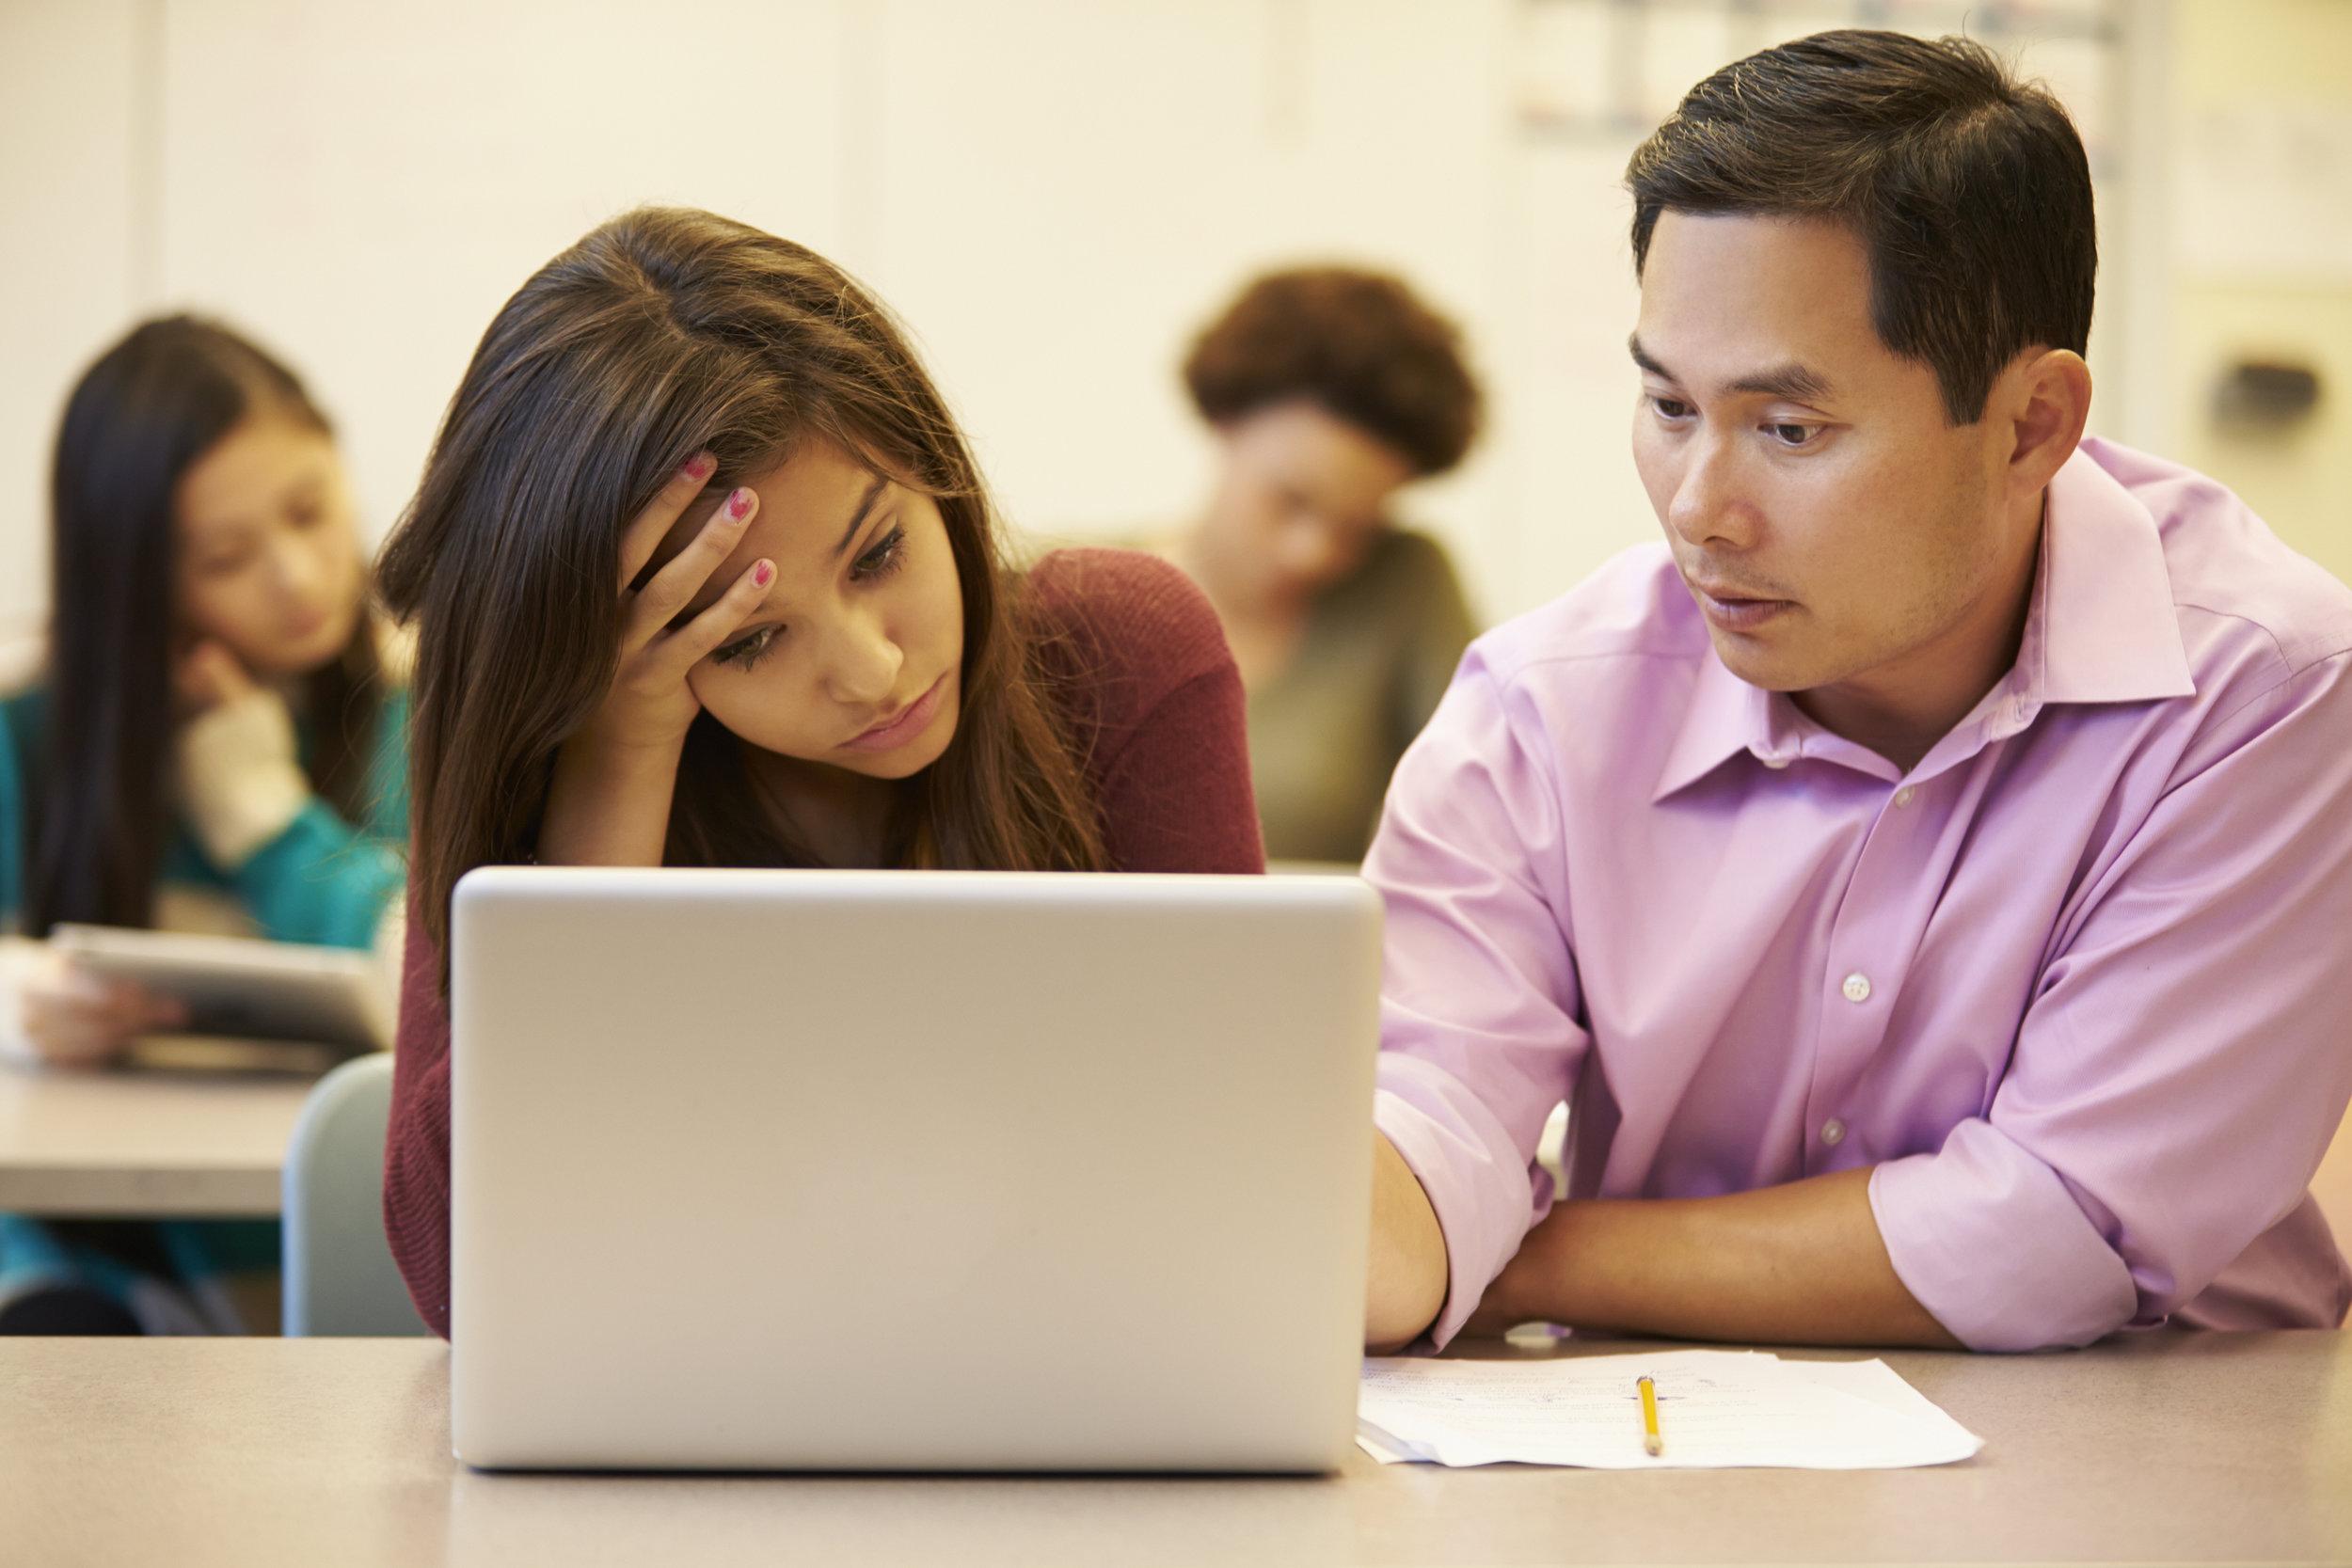 high-school-teacher-helping-stressed-pupil-in-PB73SRY.jpg